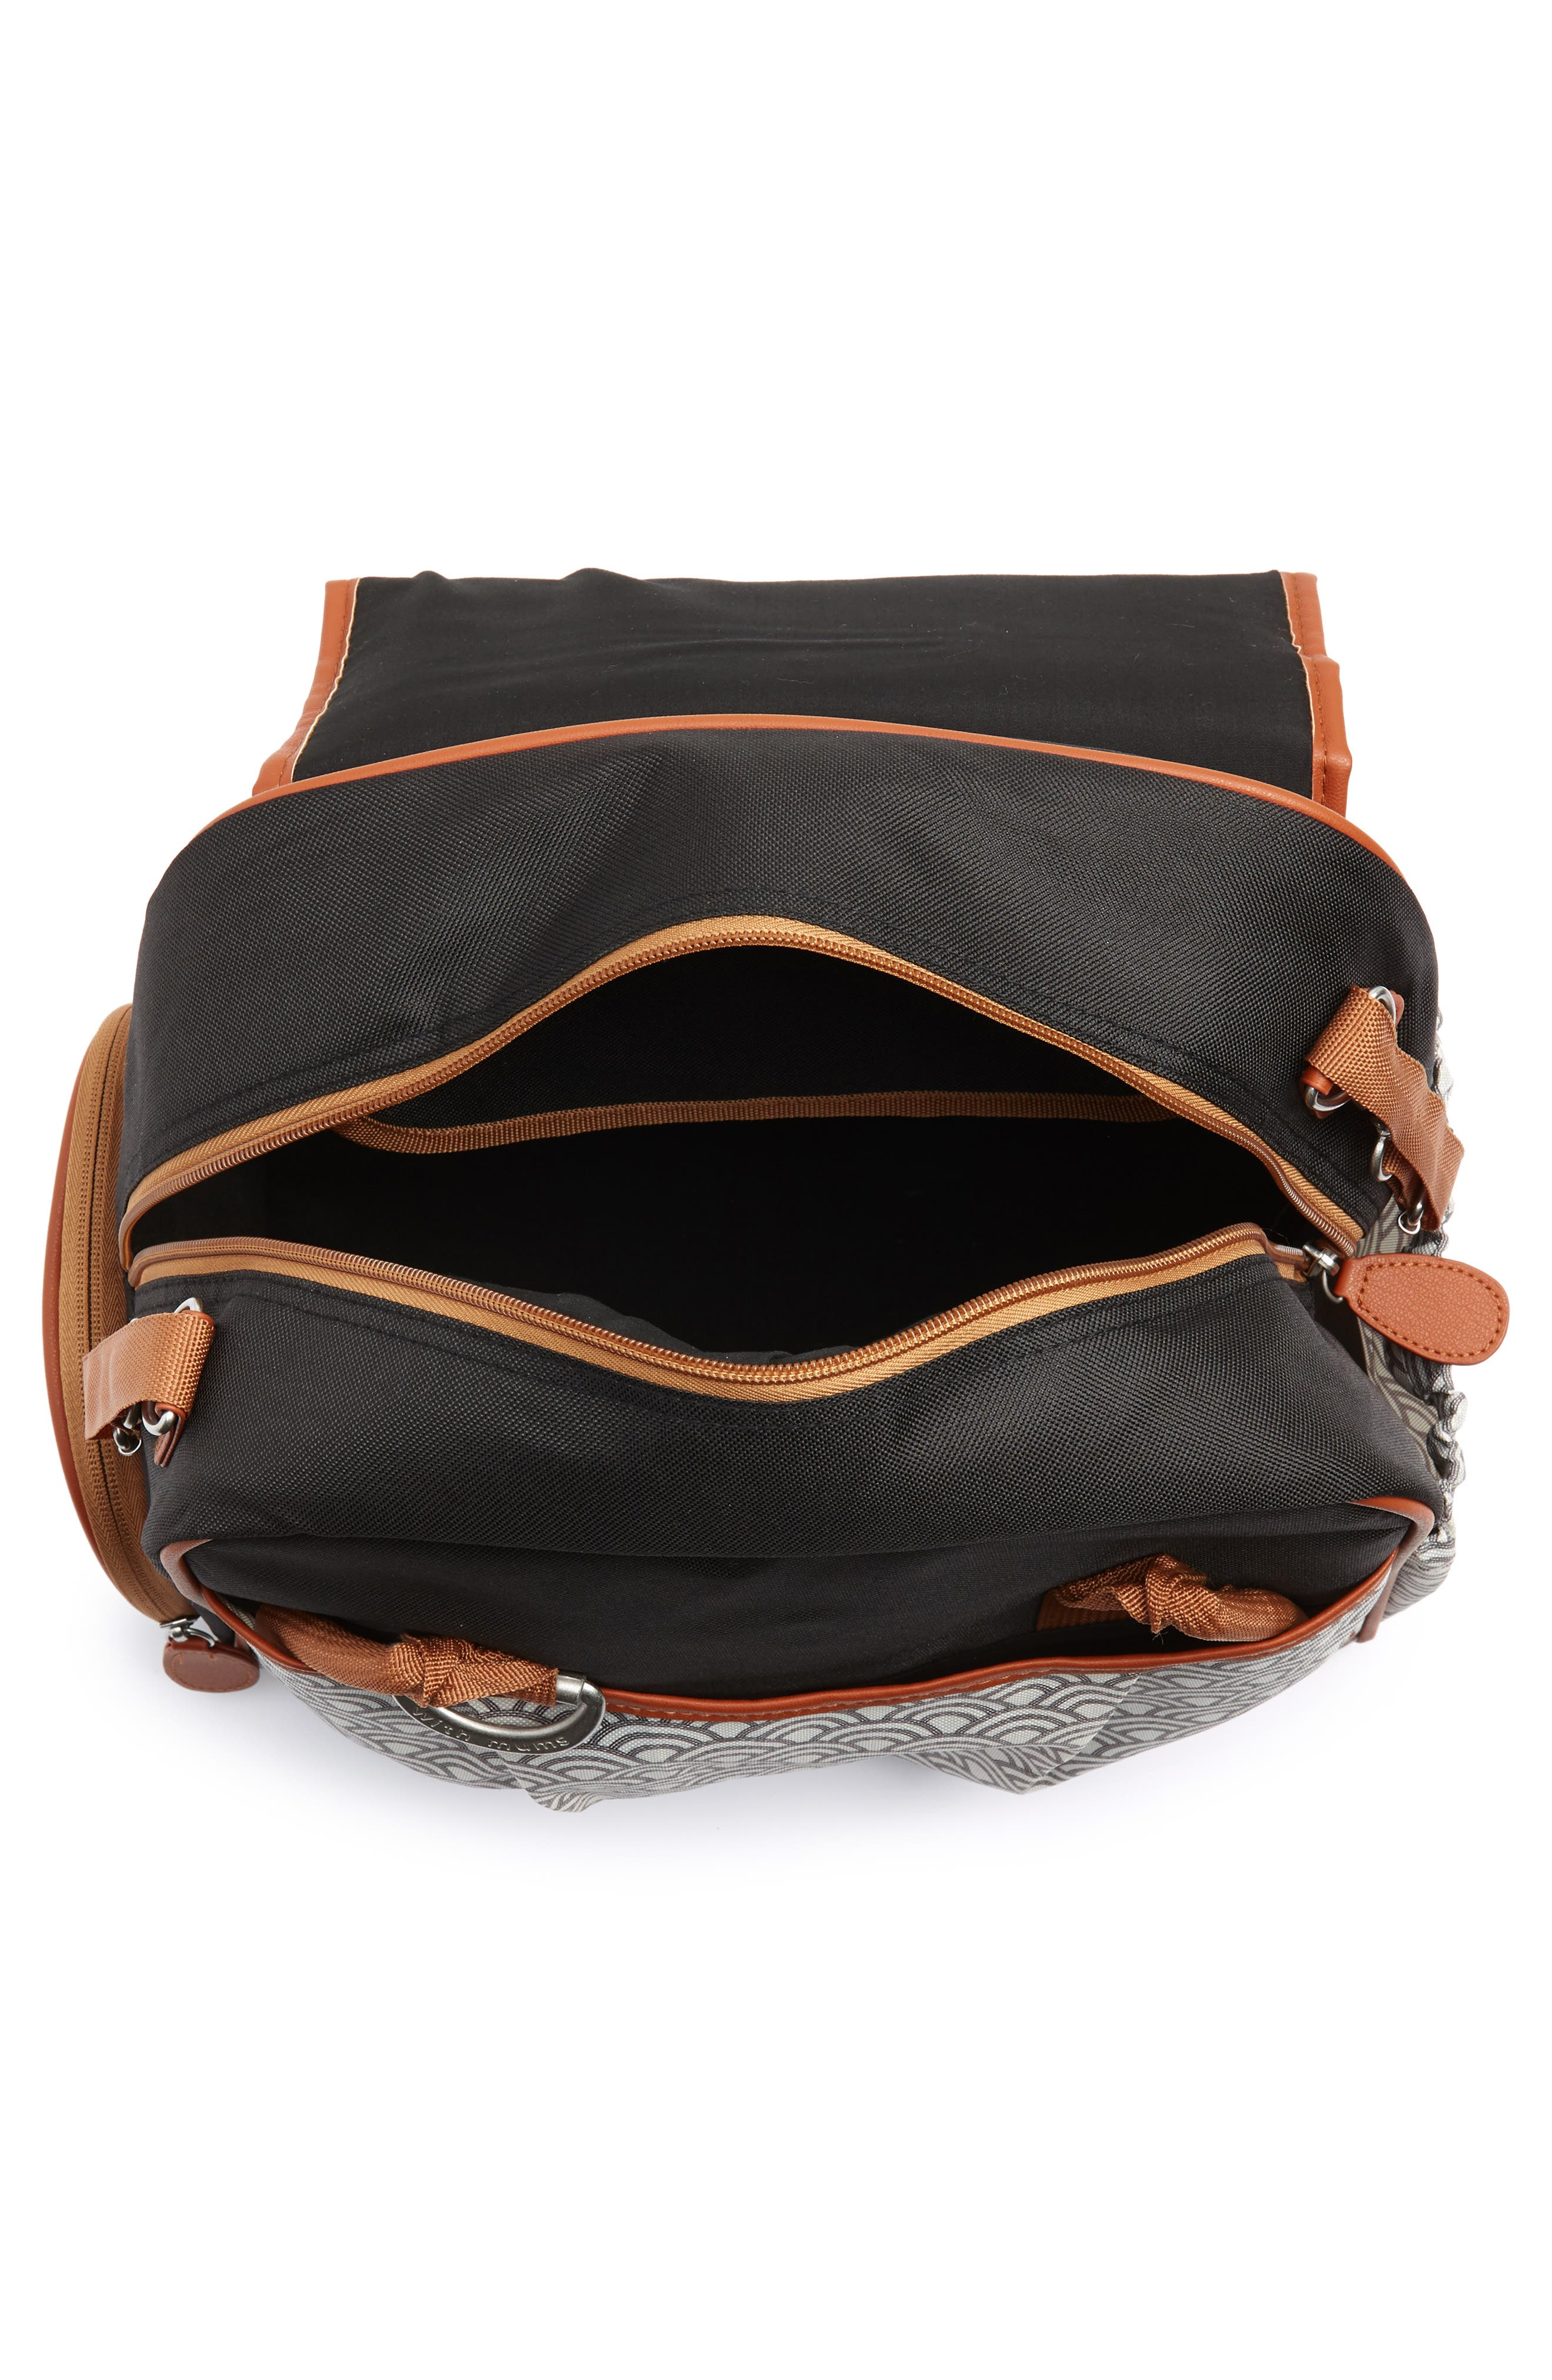 Style Diaper Bag,                             Alternate thumbnail 5, color,                             BLACK